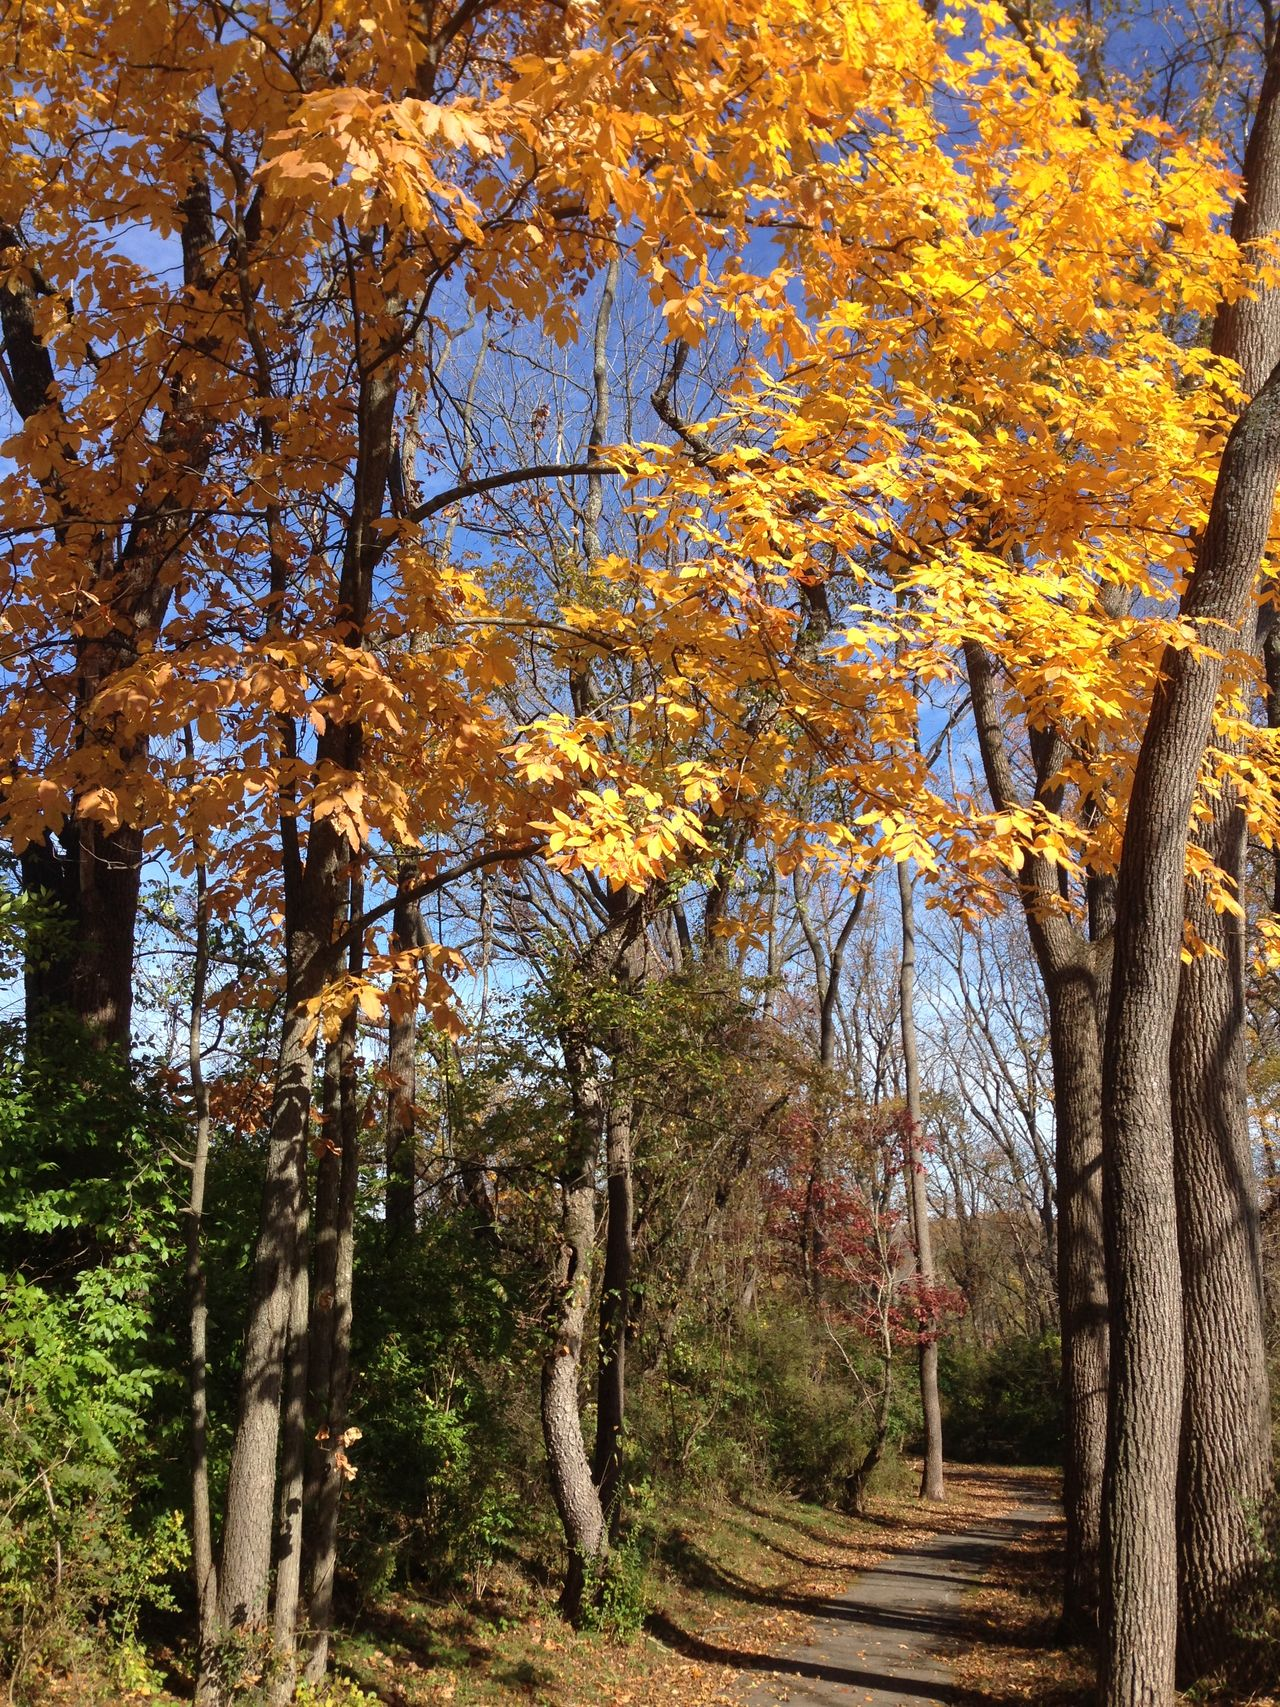 Autumn Beauty In Nature Branch Footpath No People Outdoors Scenics Season  The Week On EyeEm Tree Tree Trunk Treelined Walking Path Yellow Leaves